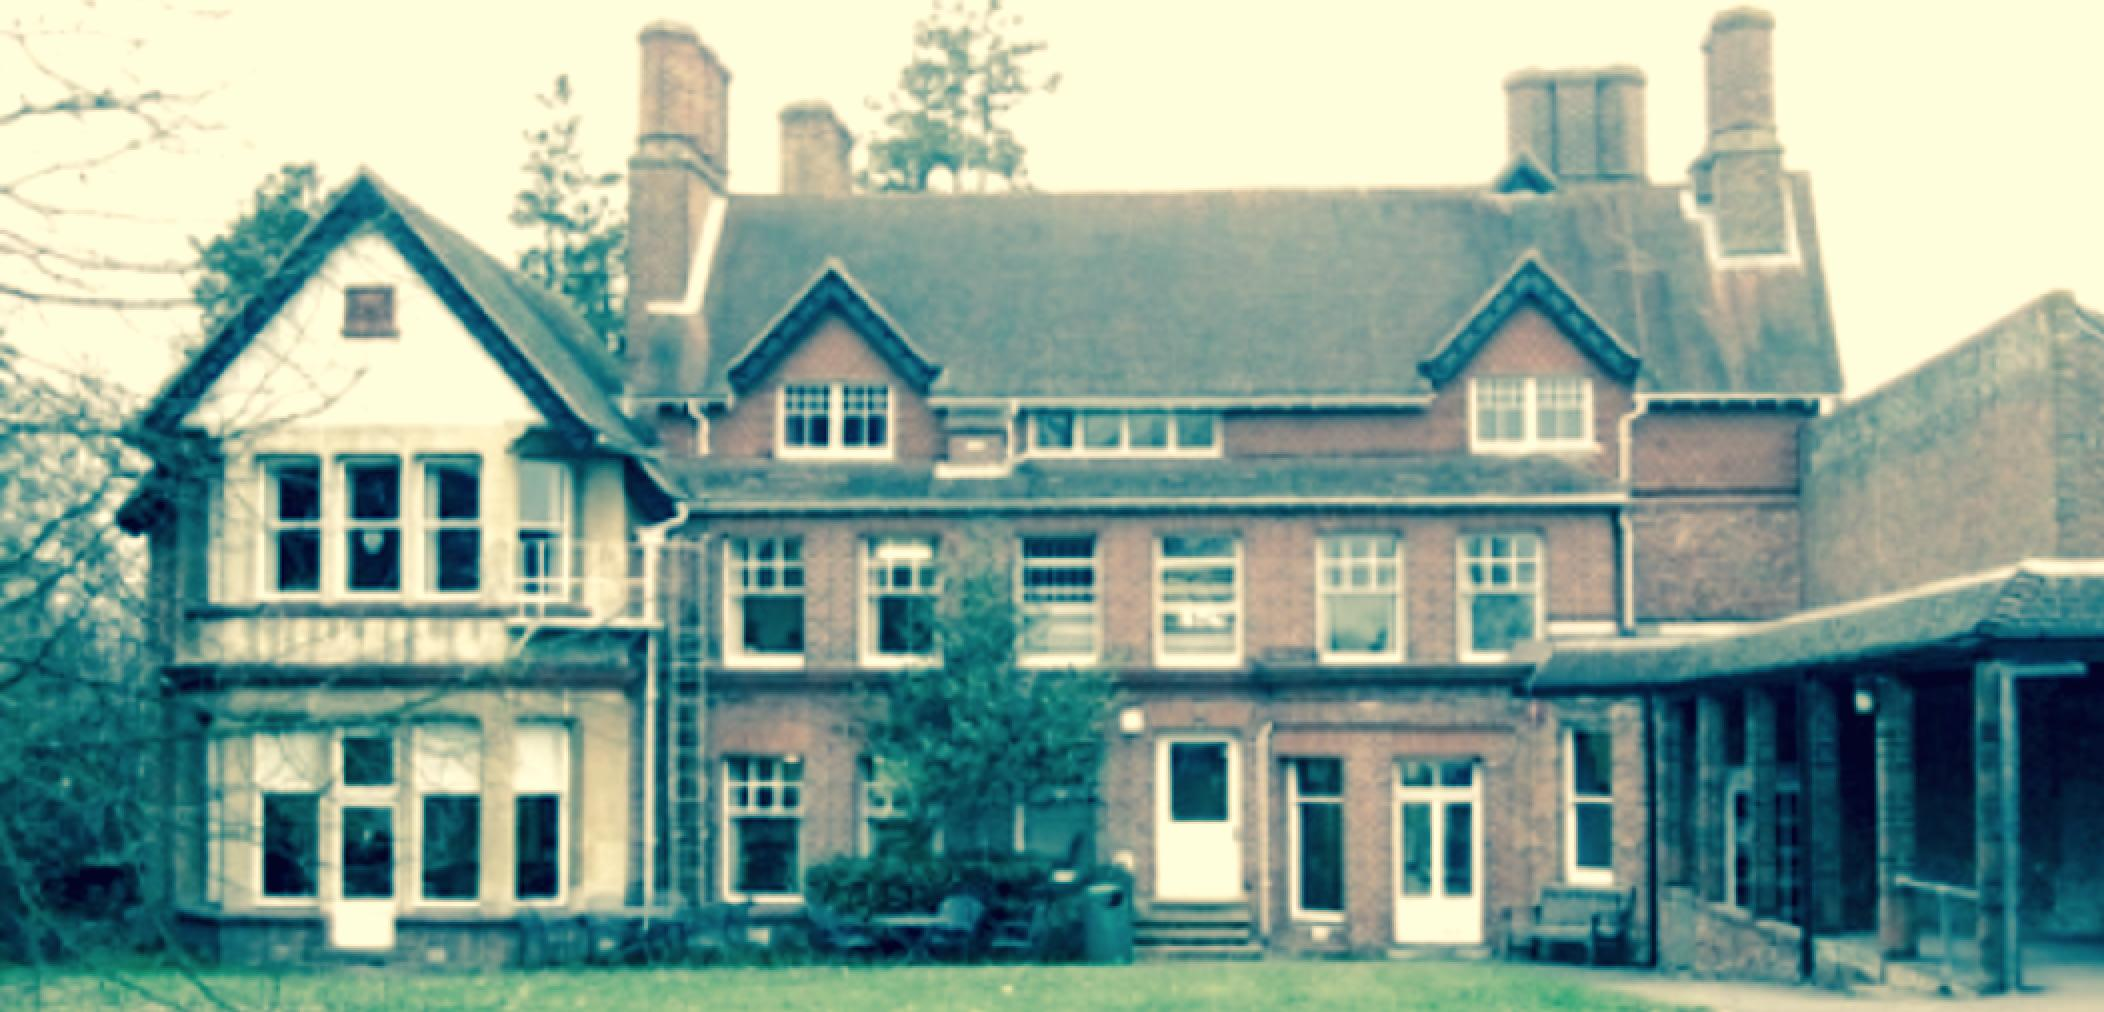 Holt School Wokingham